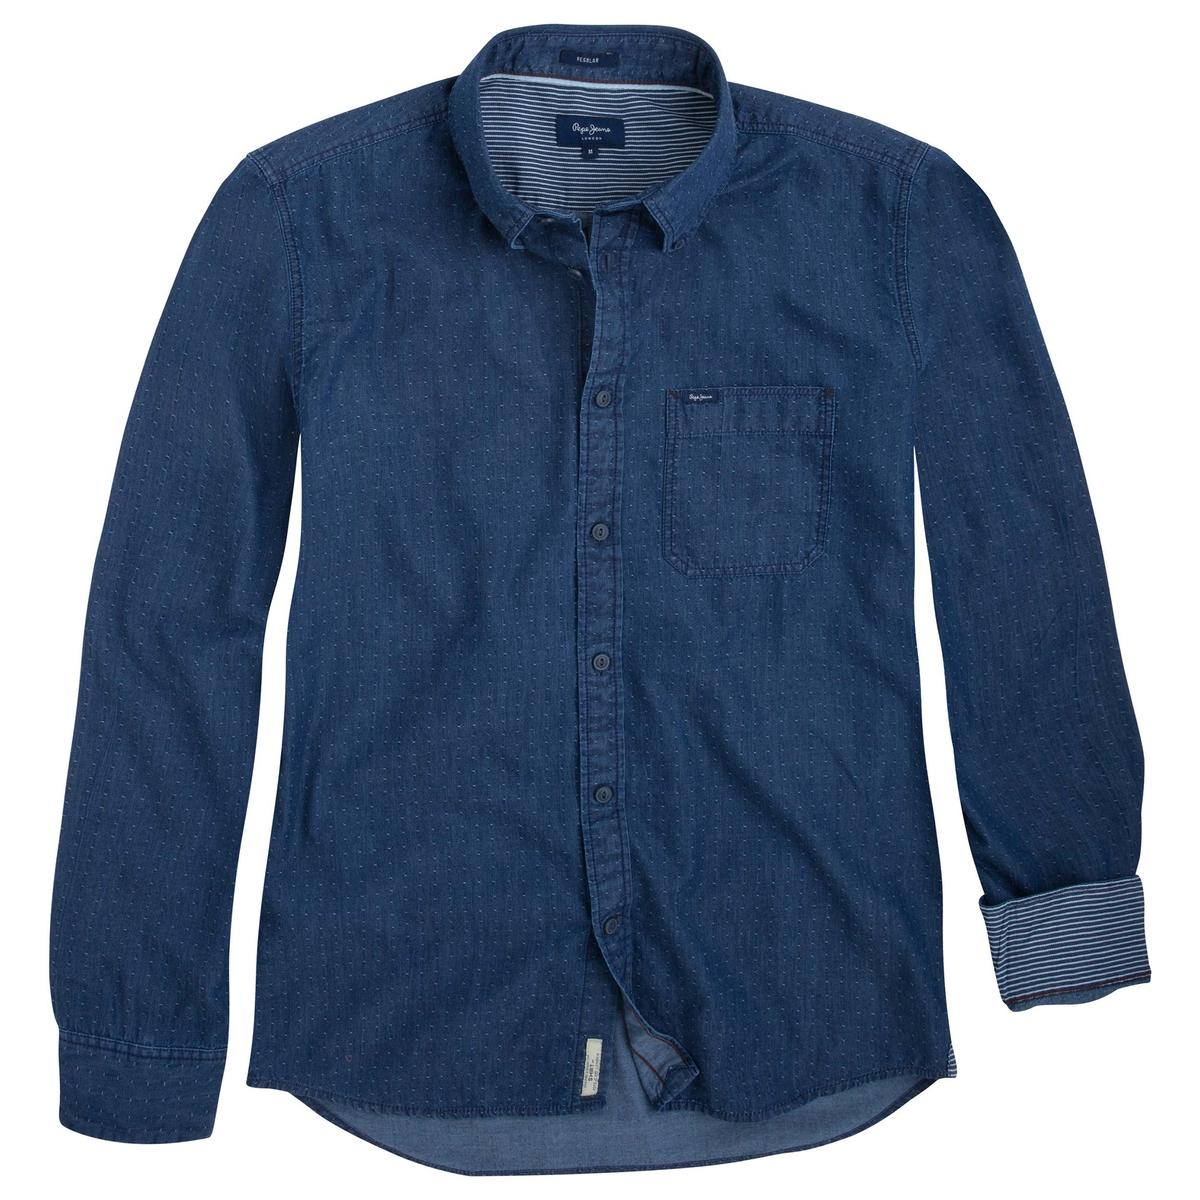 Рубашка PAGANO из денима в горошек рубашка в клетку из денима gamix3